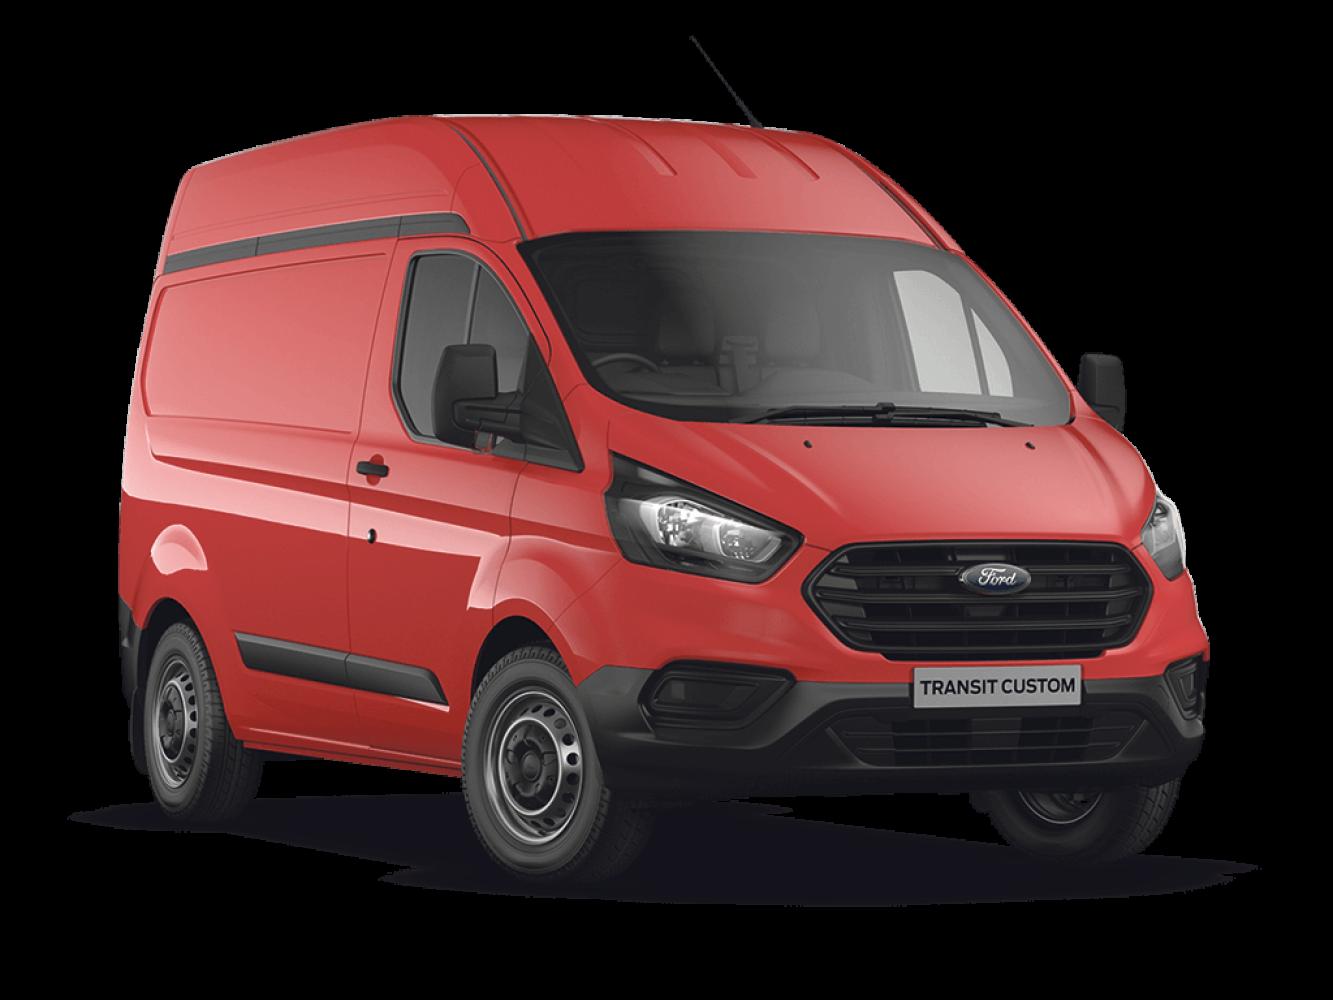 new ford transit custom 300 l2 diesel fwd 2 0 tdci 105ps. Black Bedroom Furniture Sets. Home Design Ideas